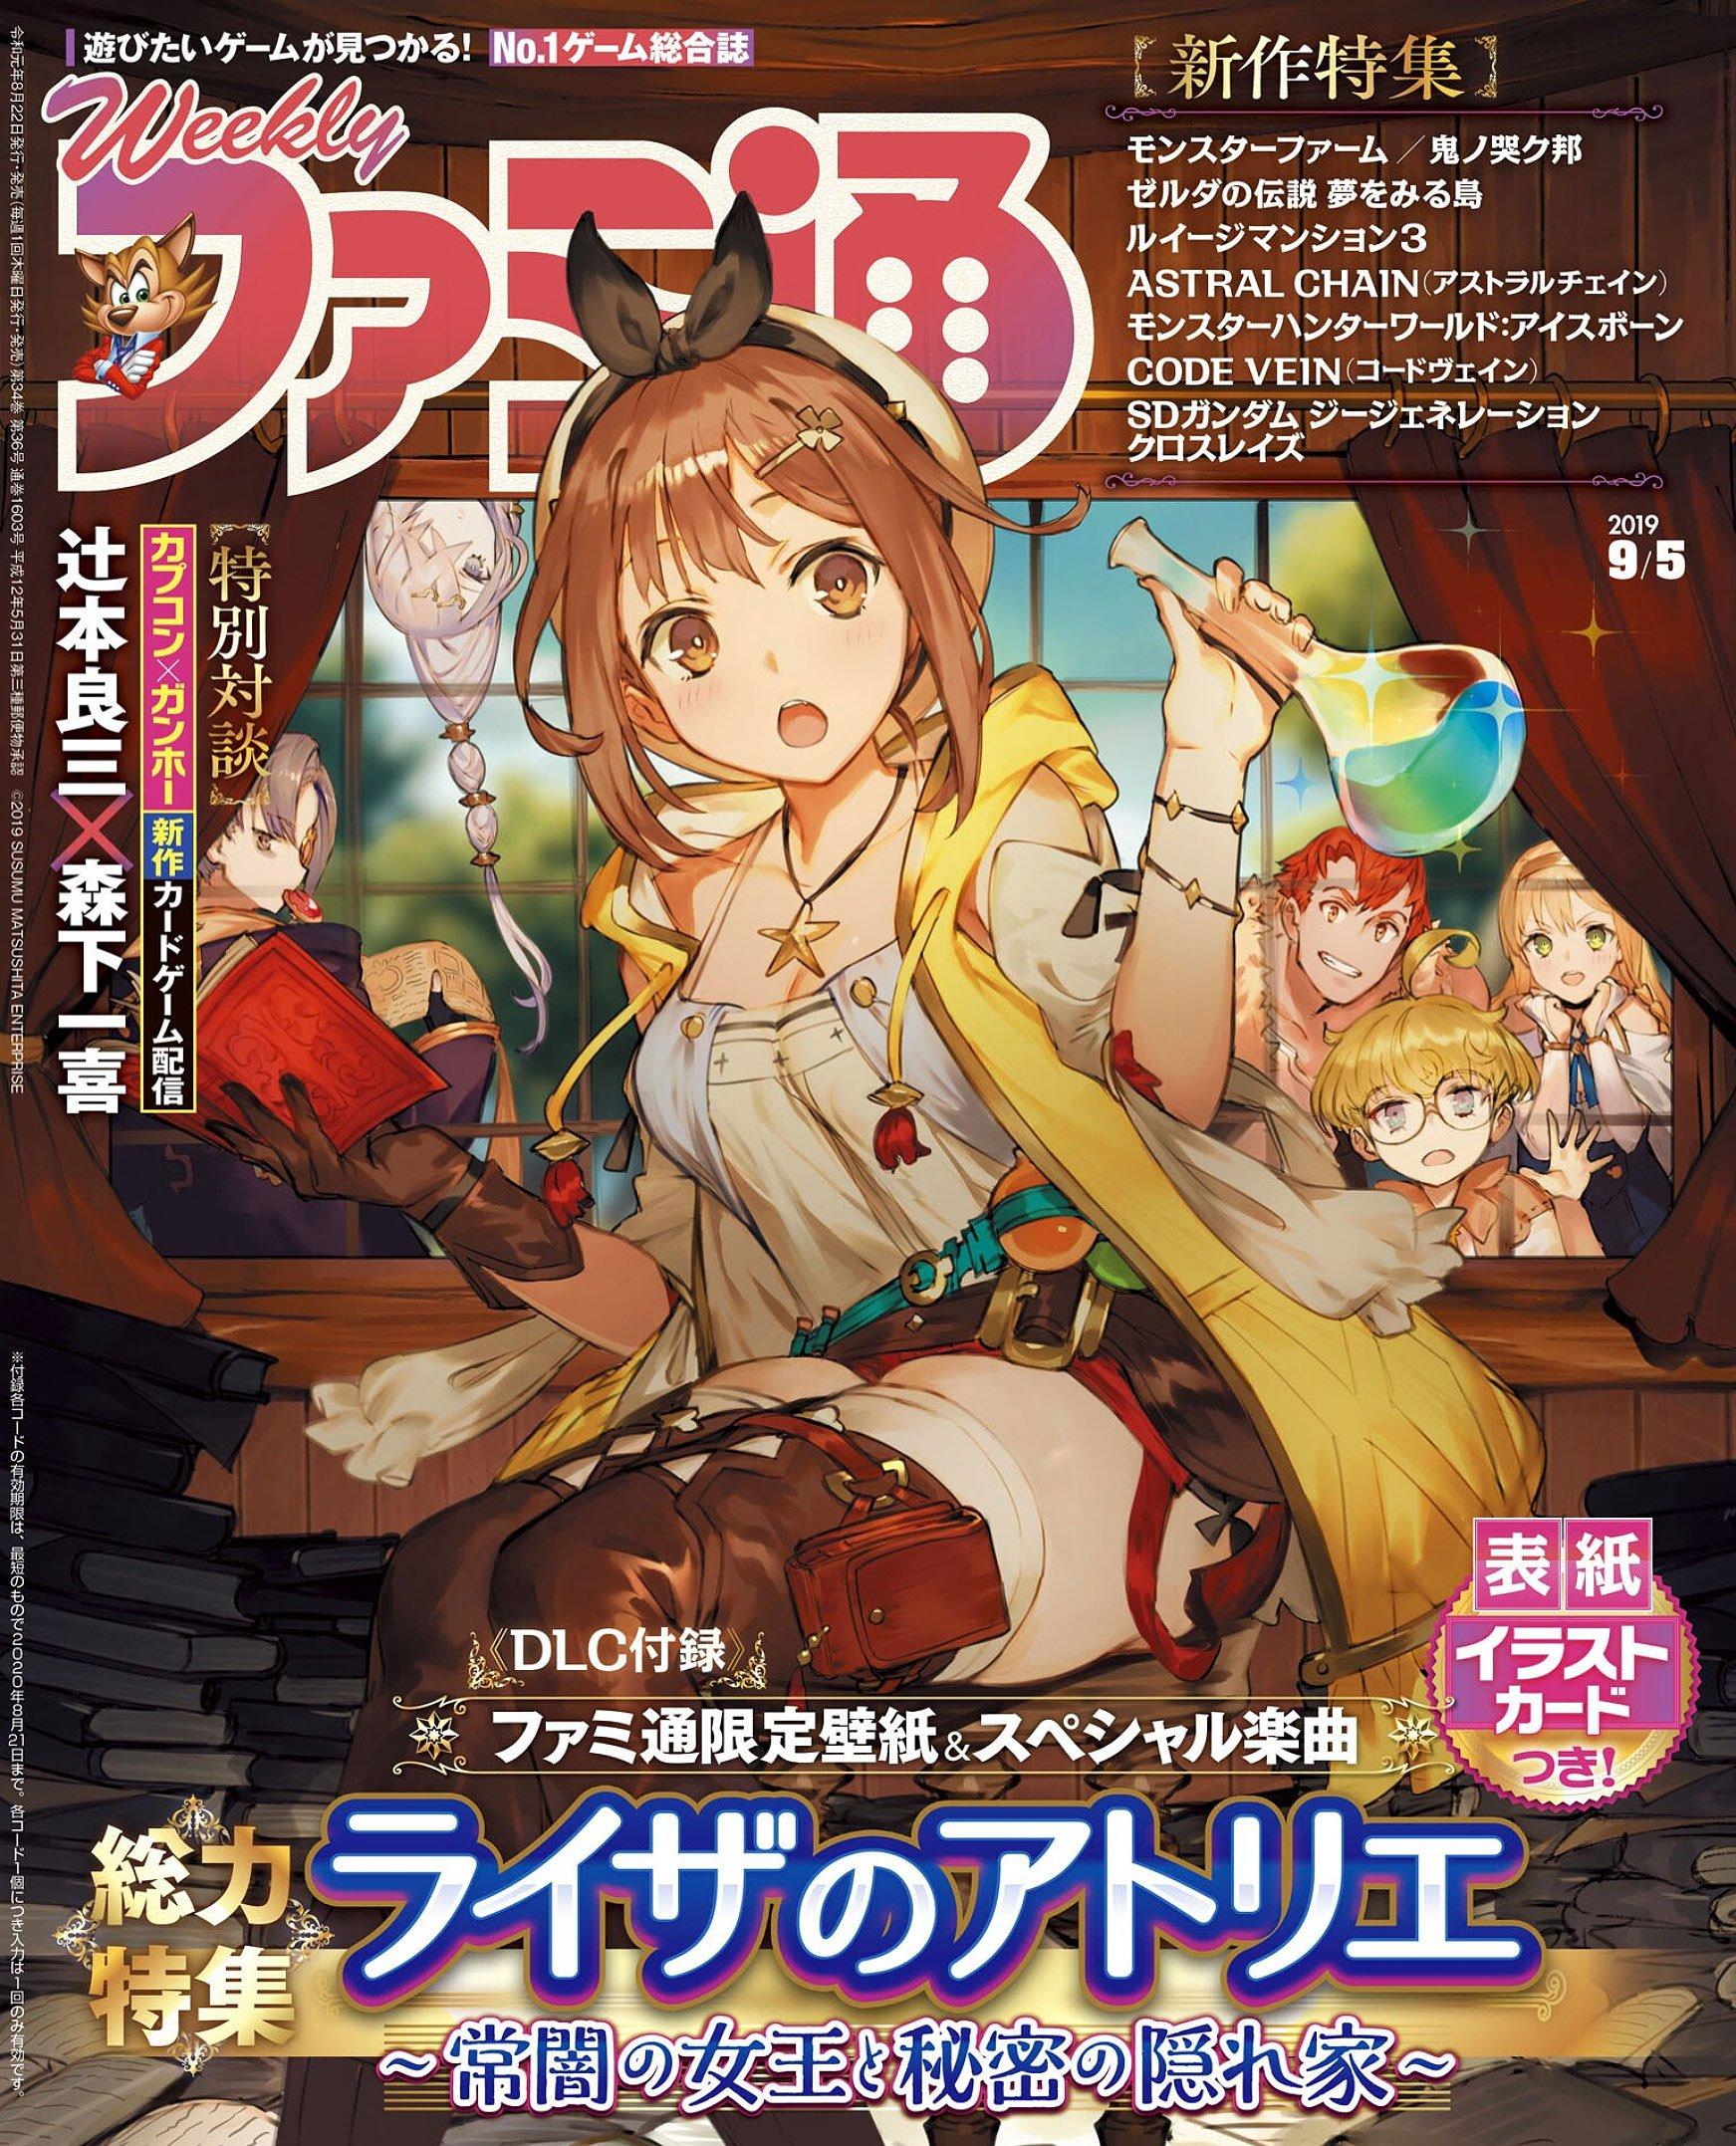 Famitsu 1603 (September 5, 2019)